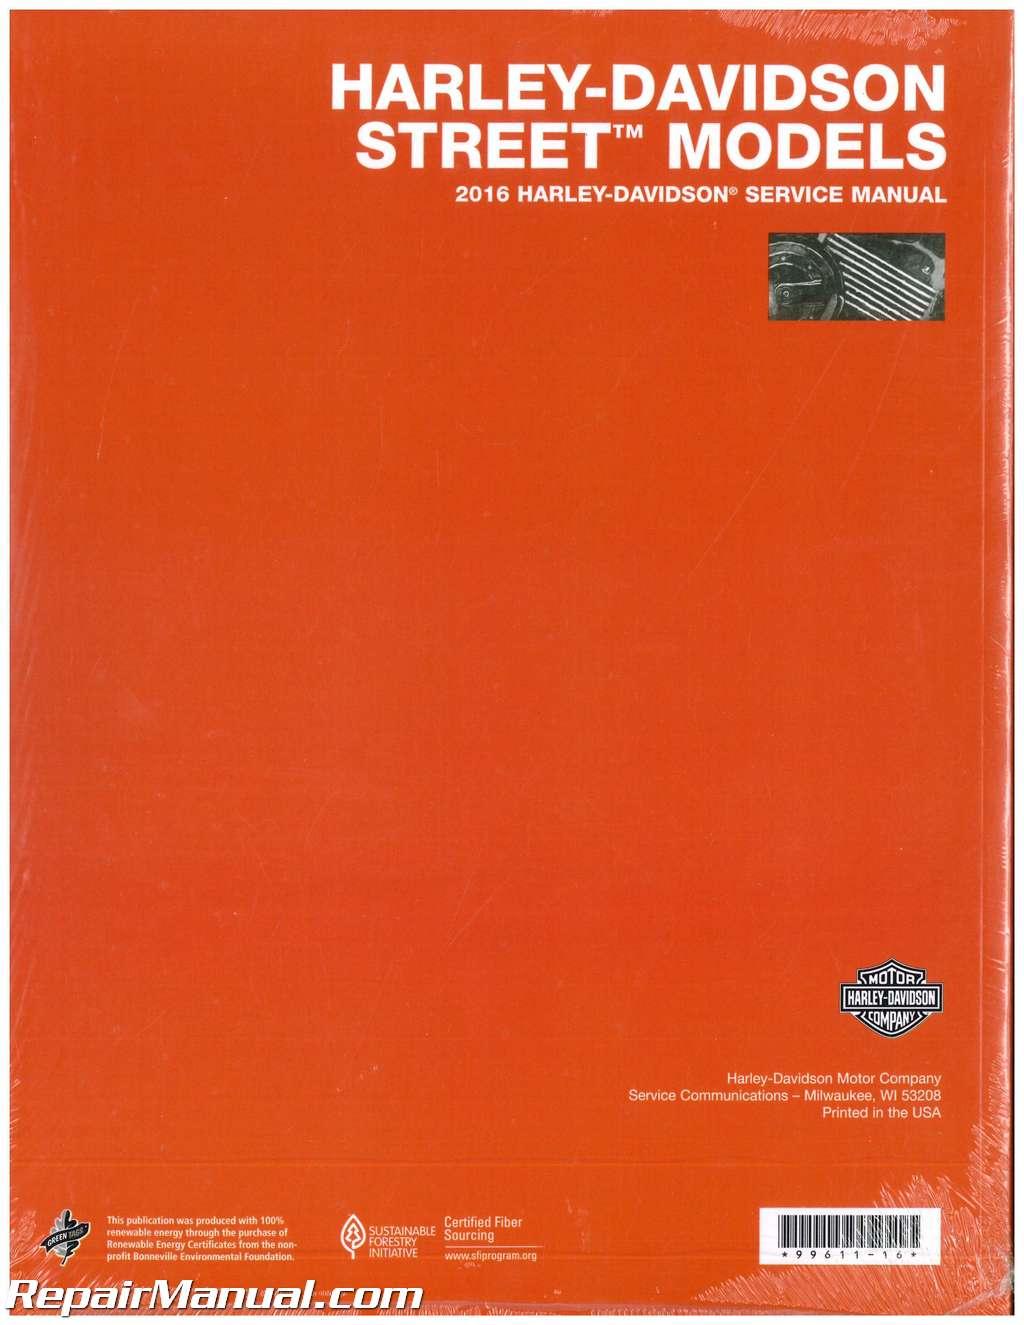 free harley davidson service manual